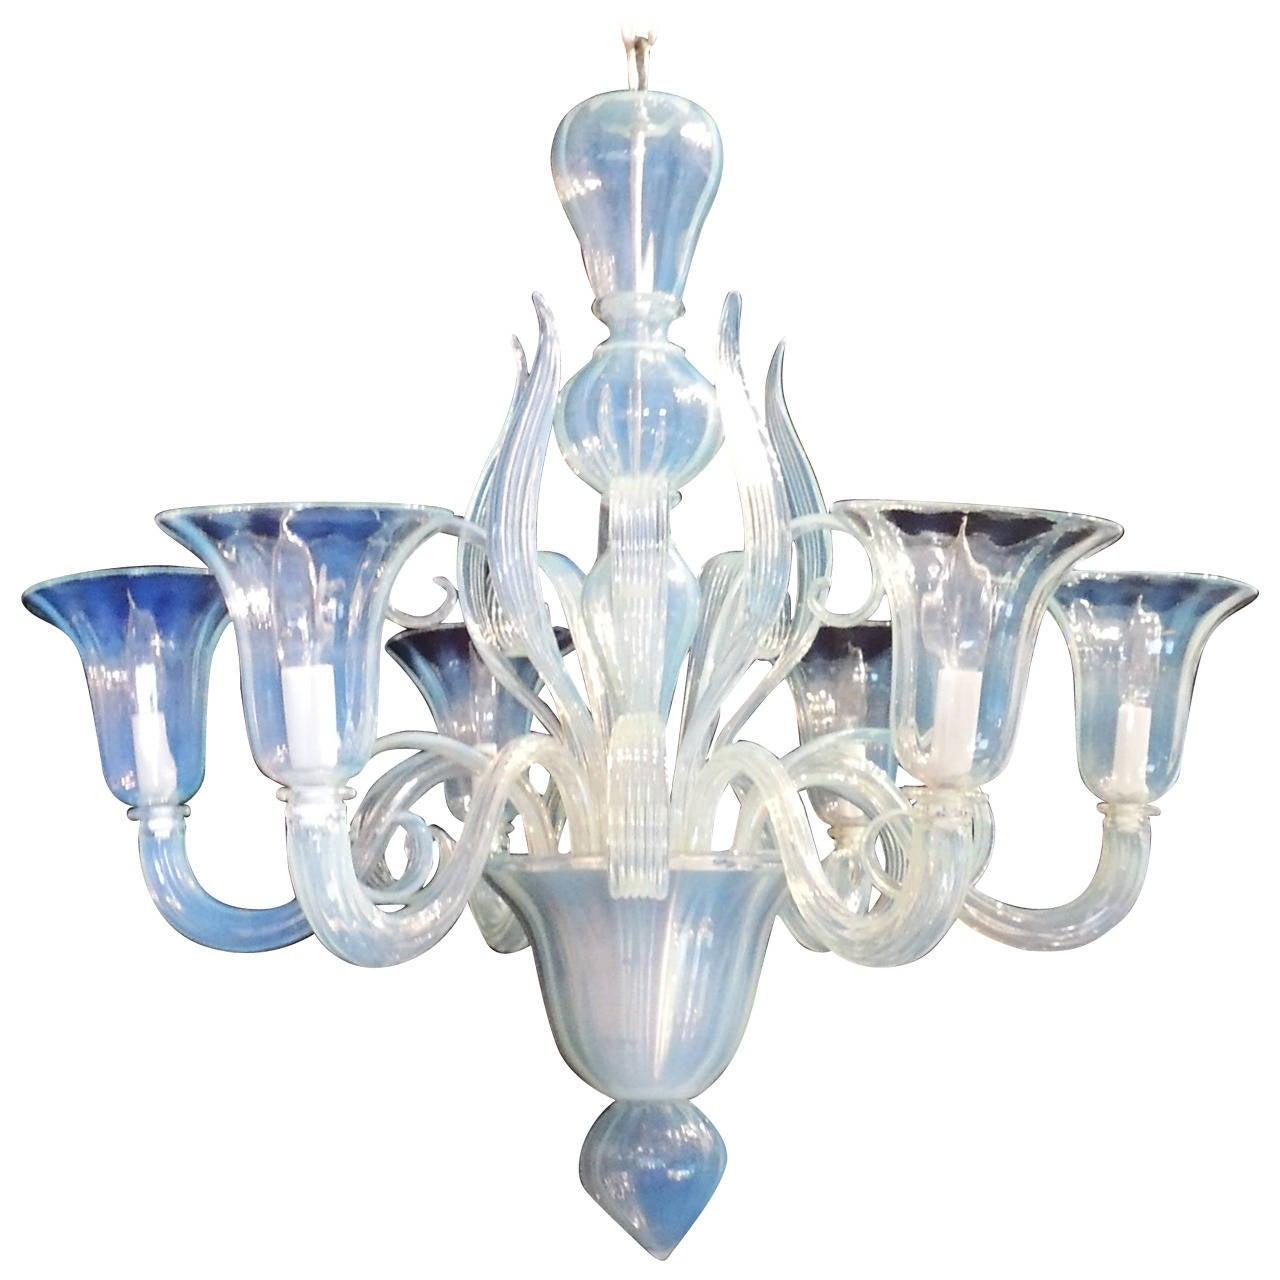 Vintage Modern Transitional Opalescent Venetian Murano Glass Chandelier Fixture At Stdibs